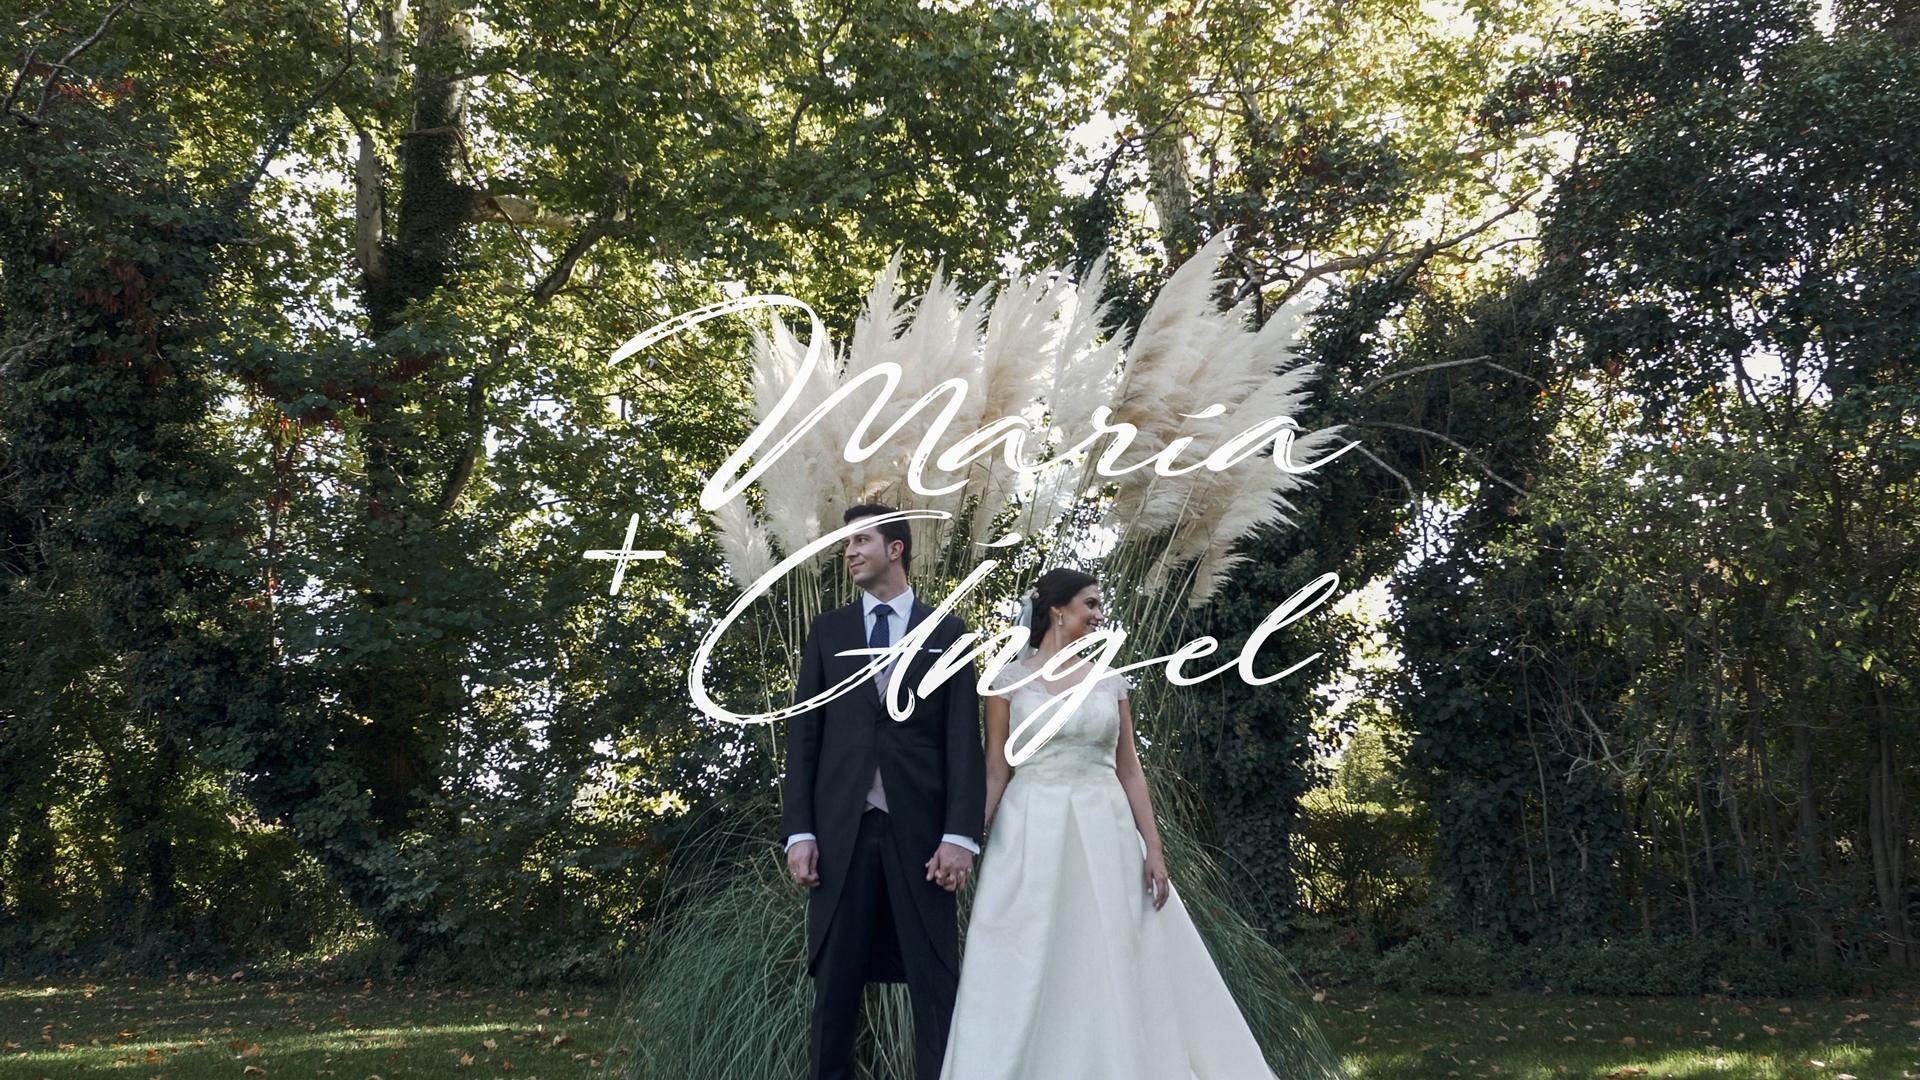 Vídeo de boda Palacio de Villahermosa - NANANAVIDEO